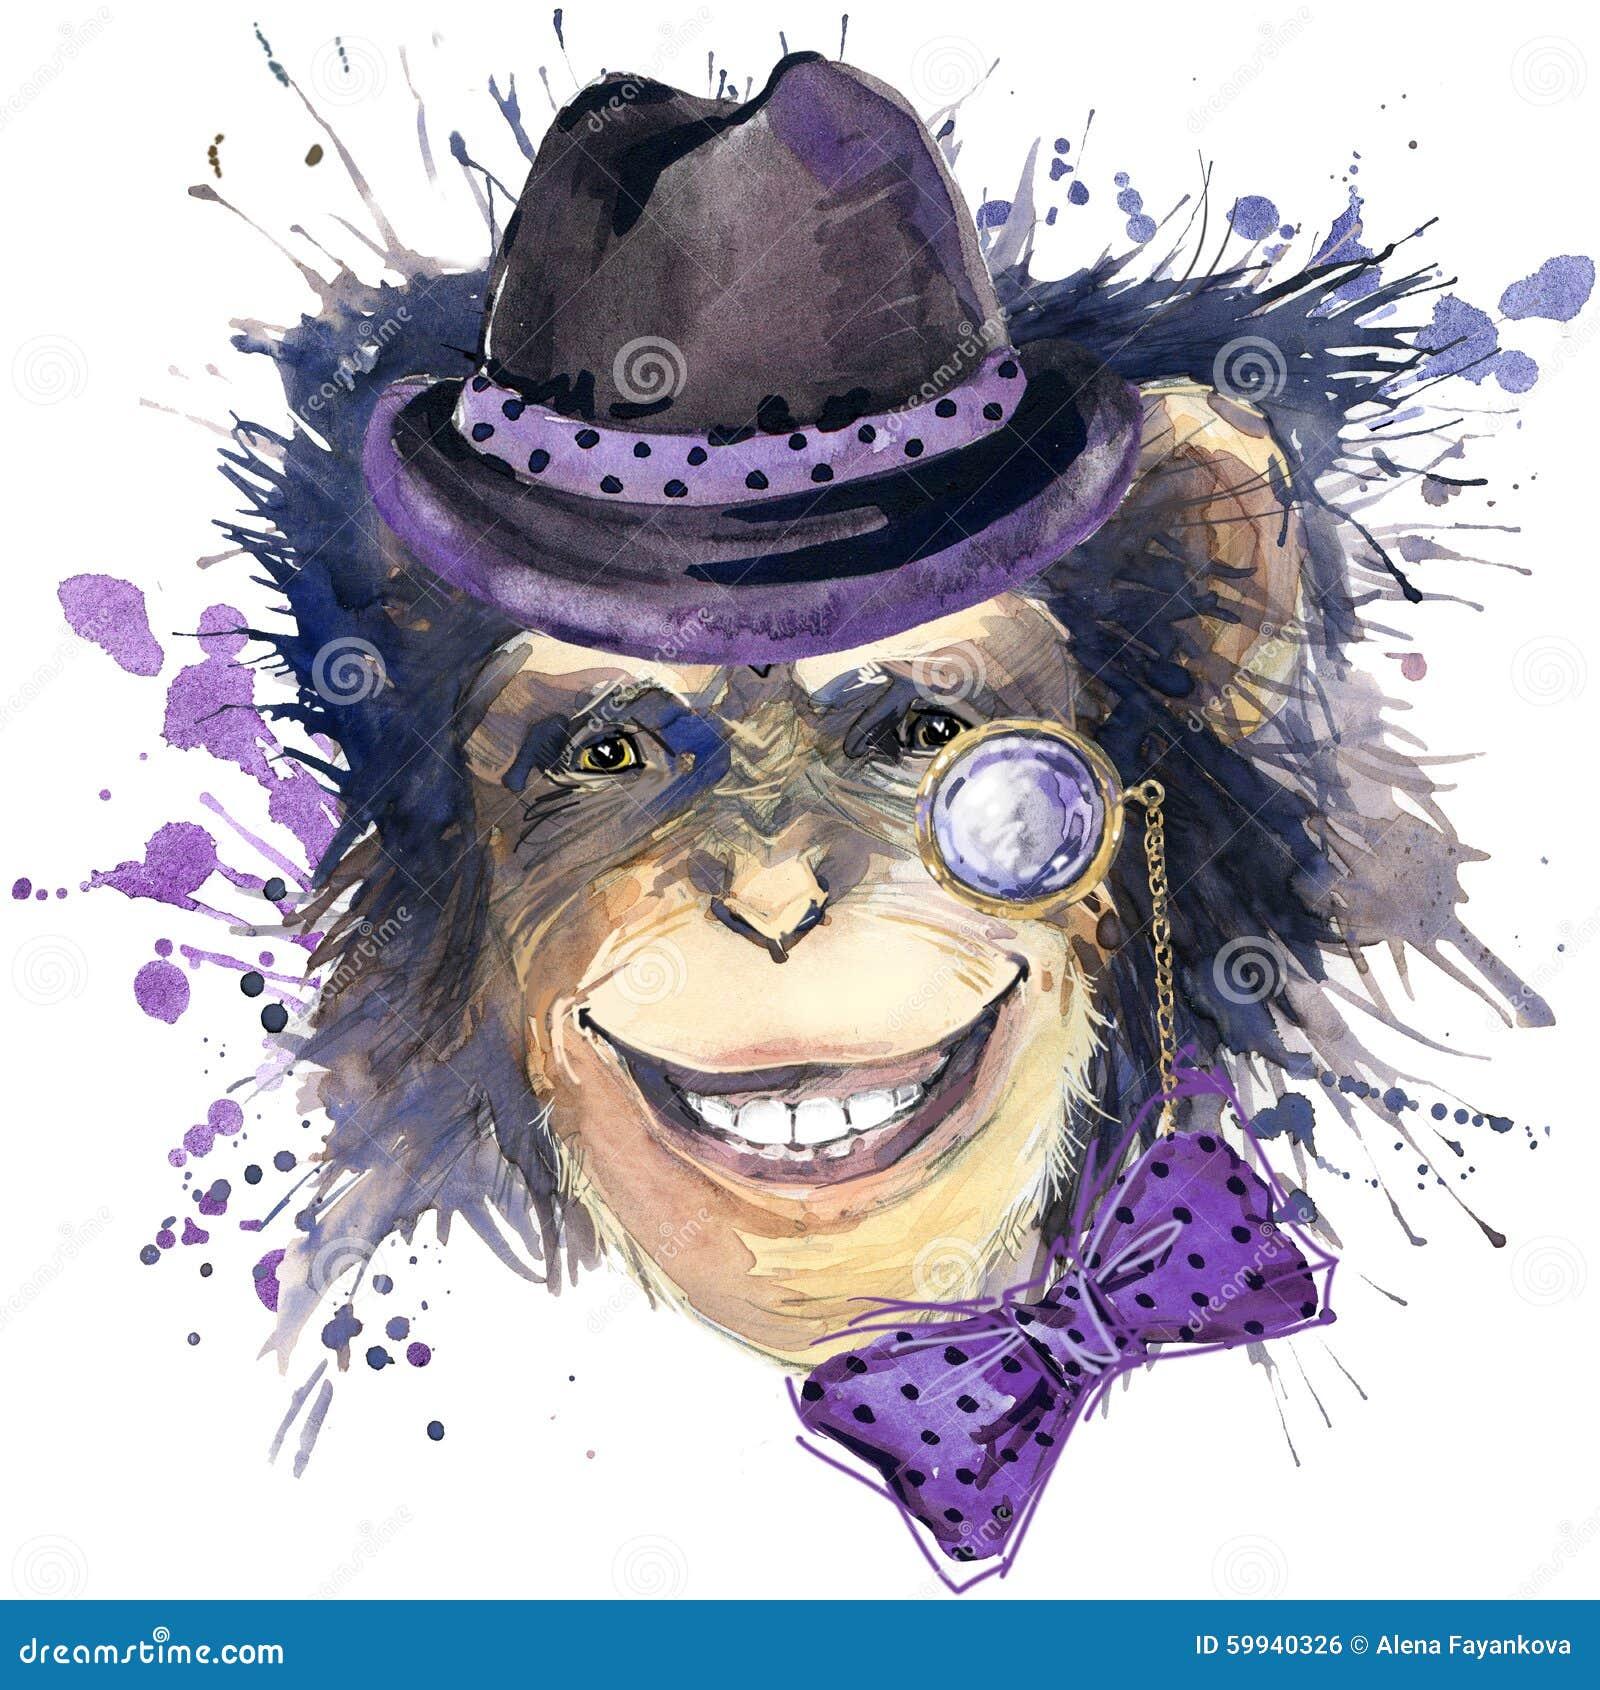 Monkey chimpanzee T-shirt graphics, monkey chimpanzee illustration with splash watercolor textured background. illustration water